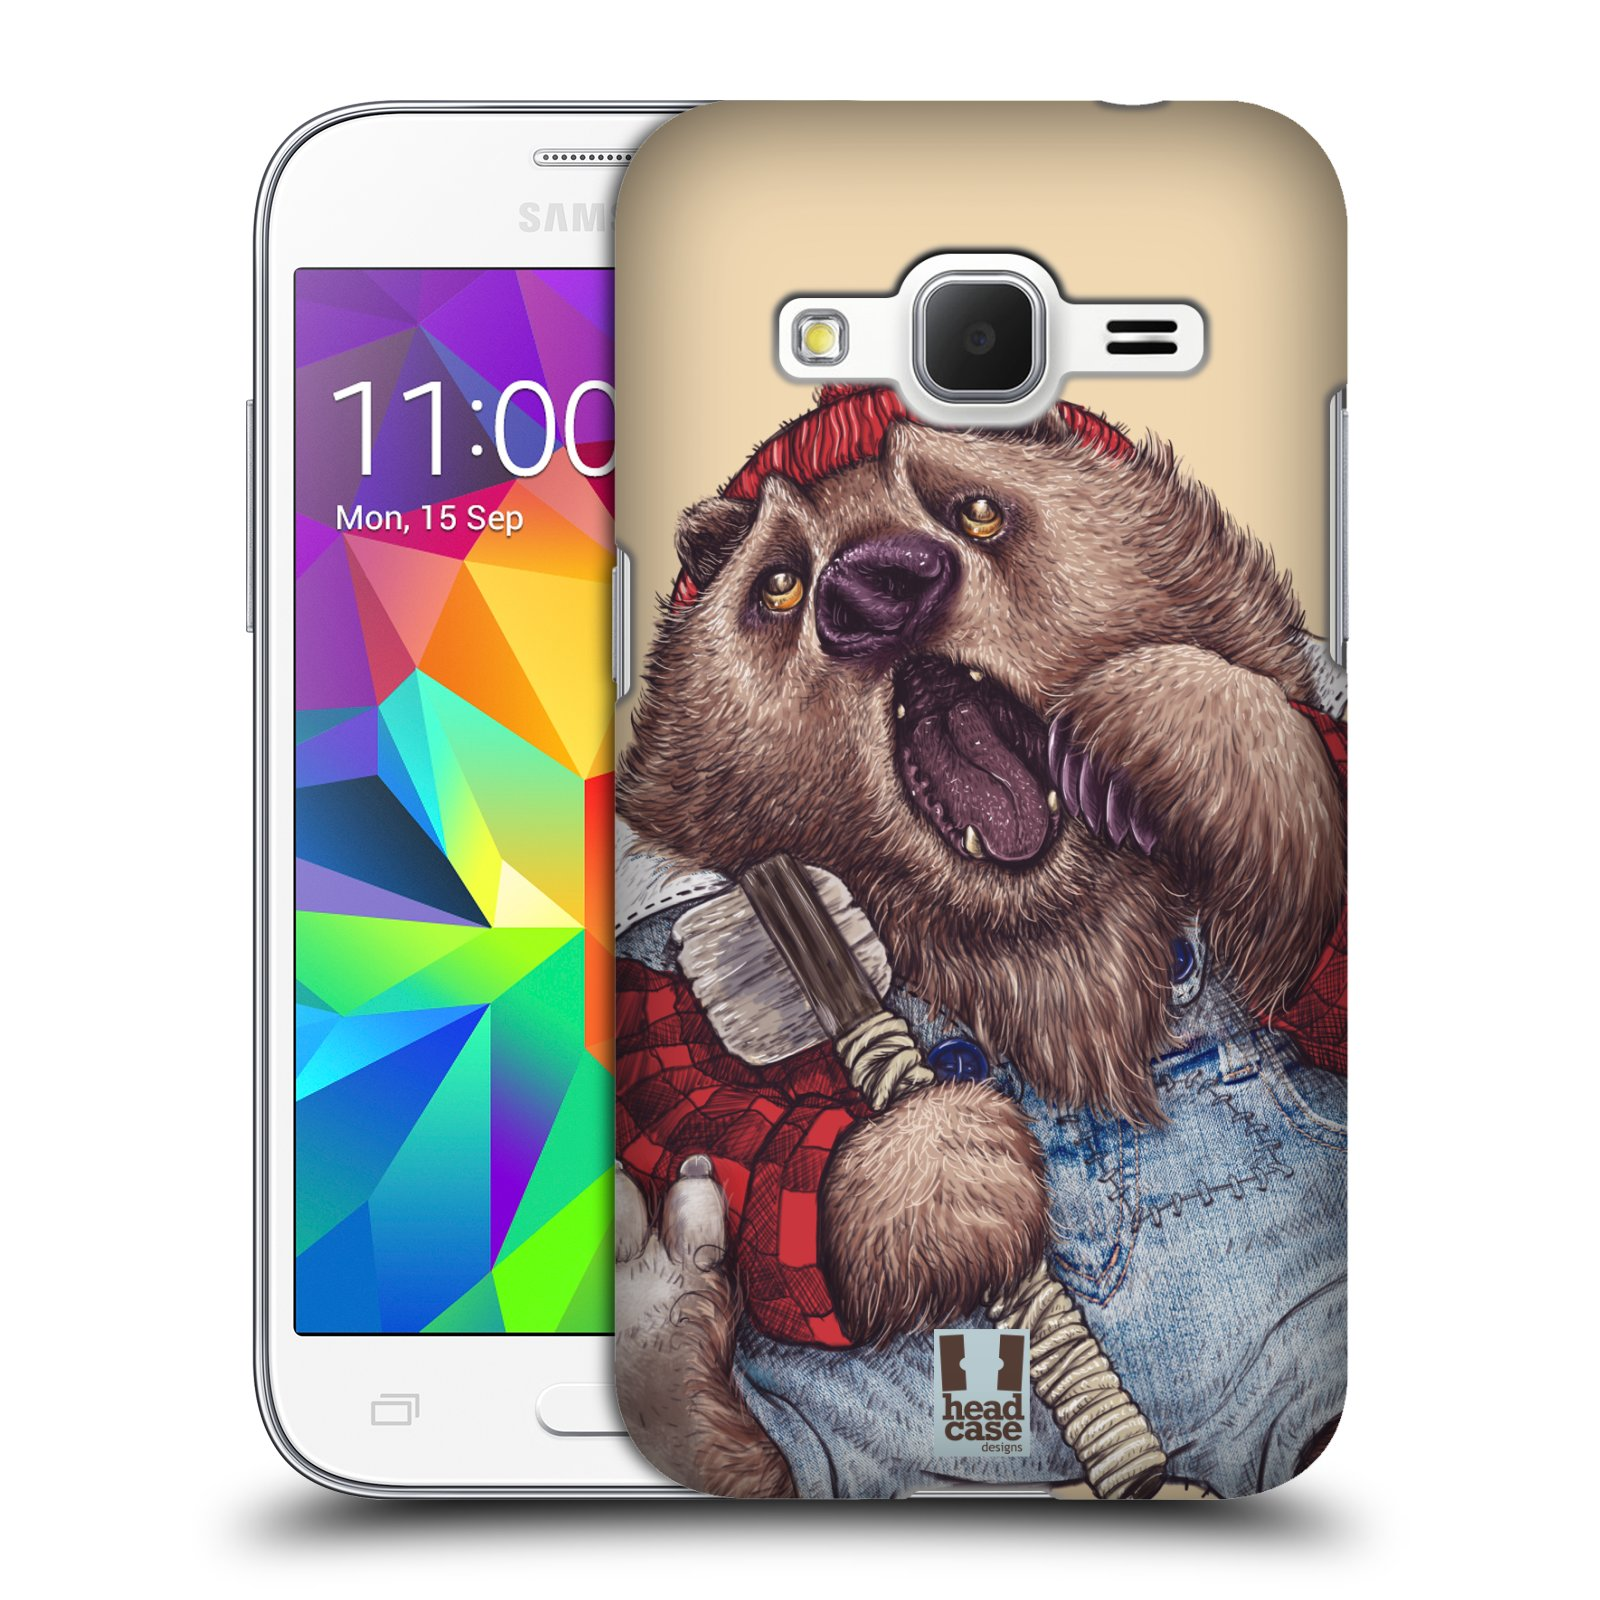 HEAD CASE plastový obal na mobil SAMSUNG GALAXY Core Prime (Core Prime VE) vzor Kreslená zvířátka medvěd